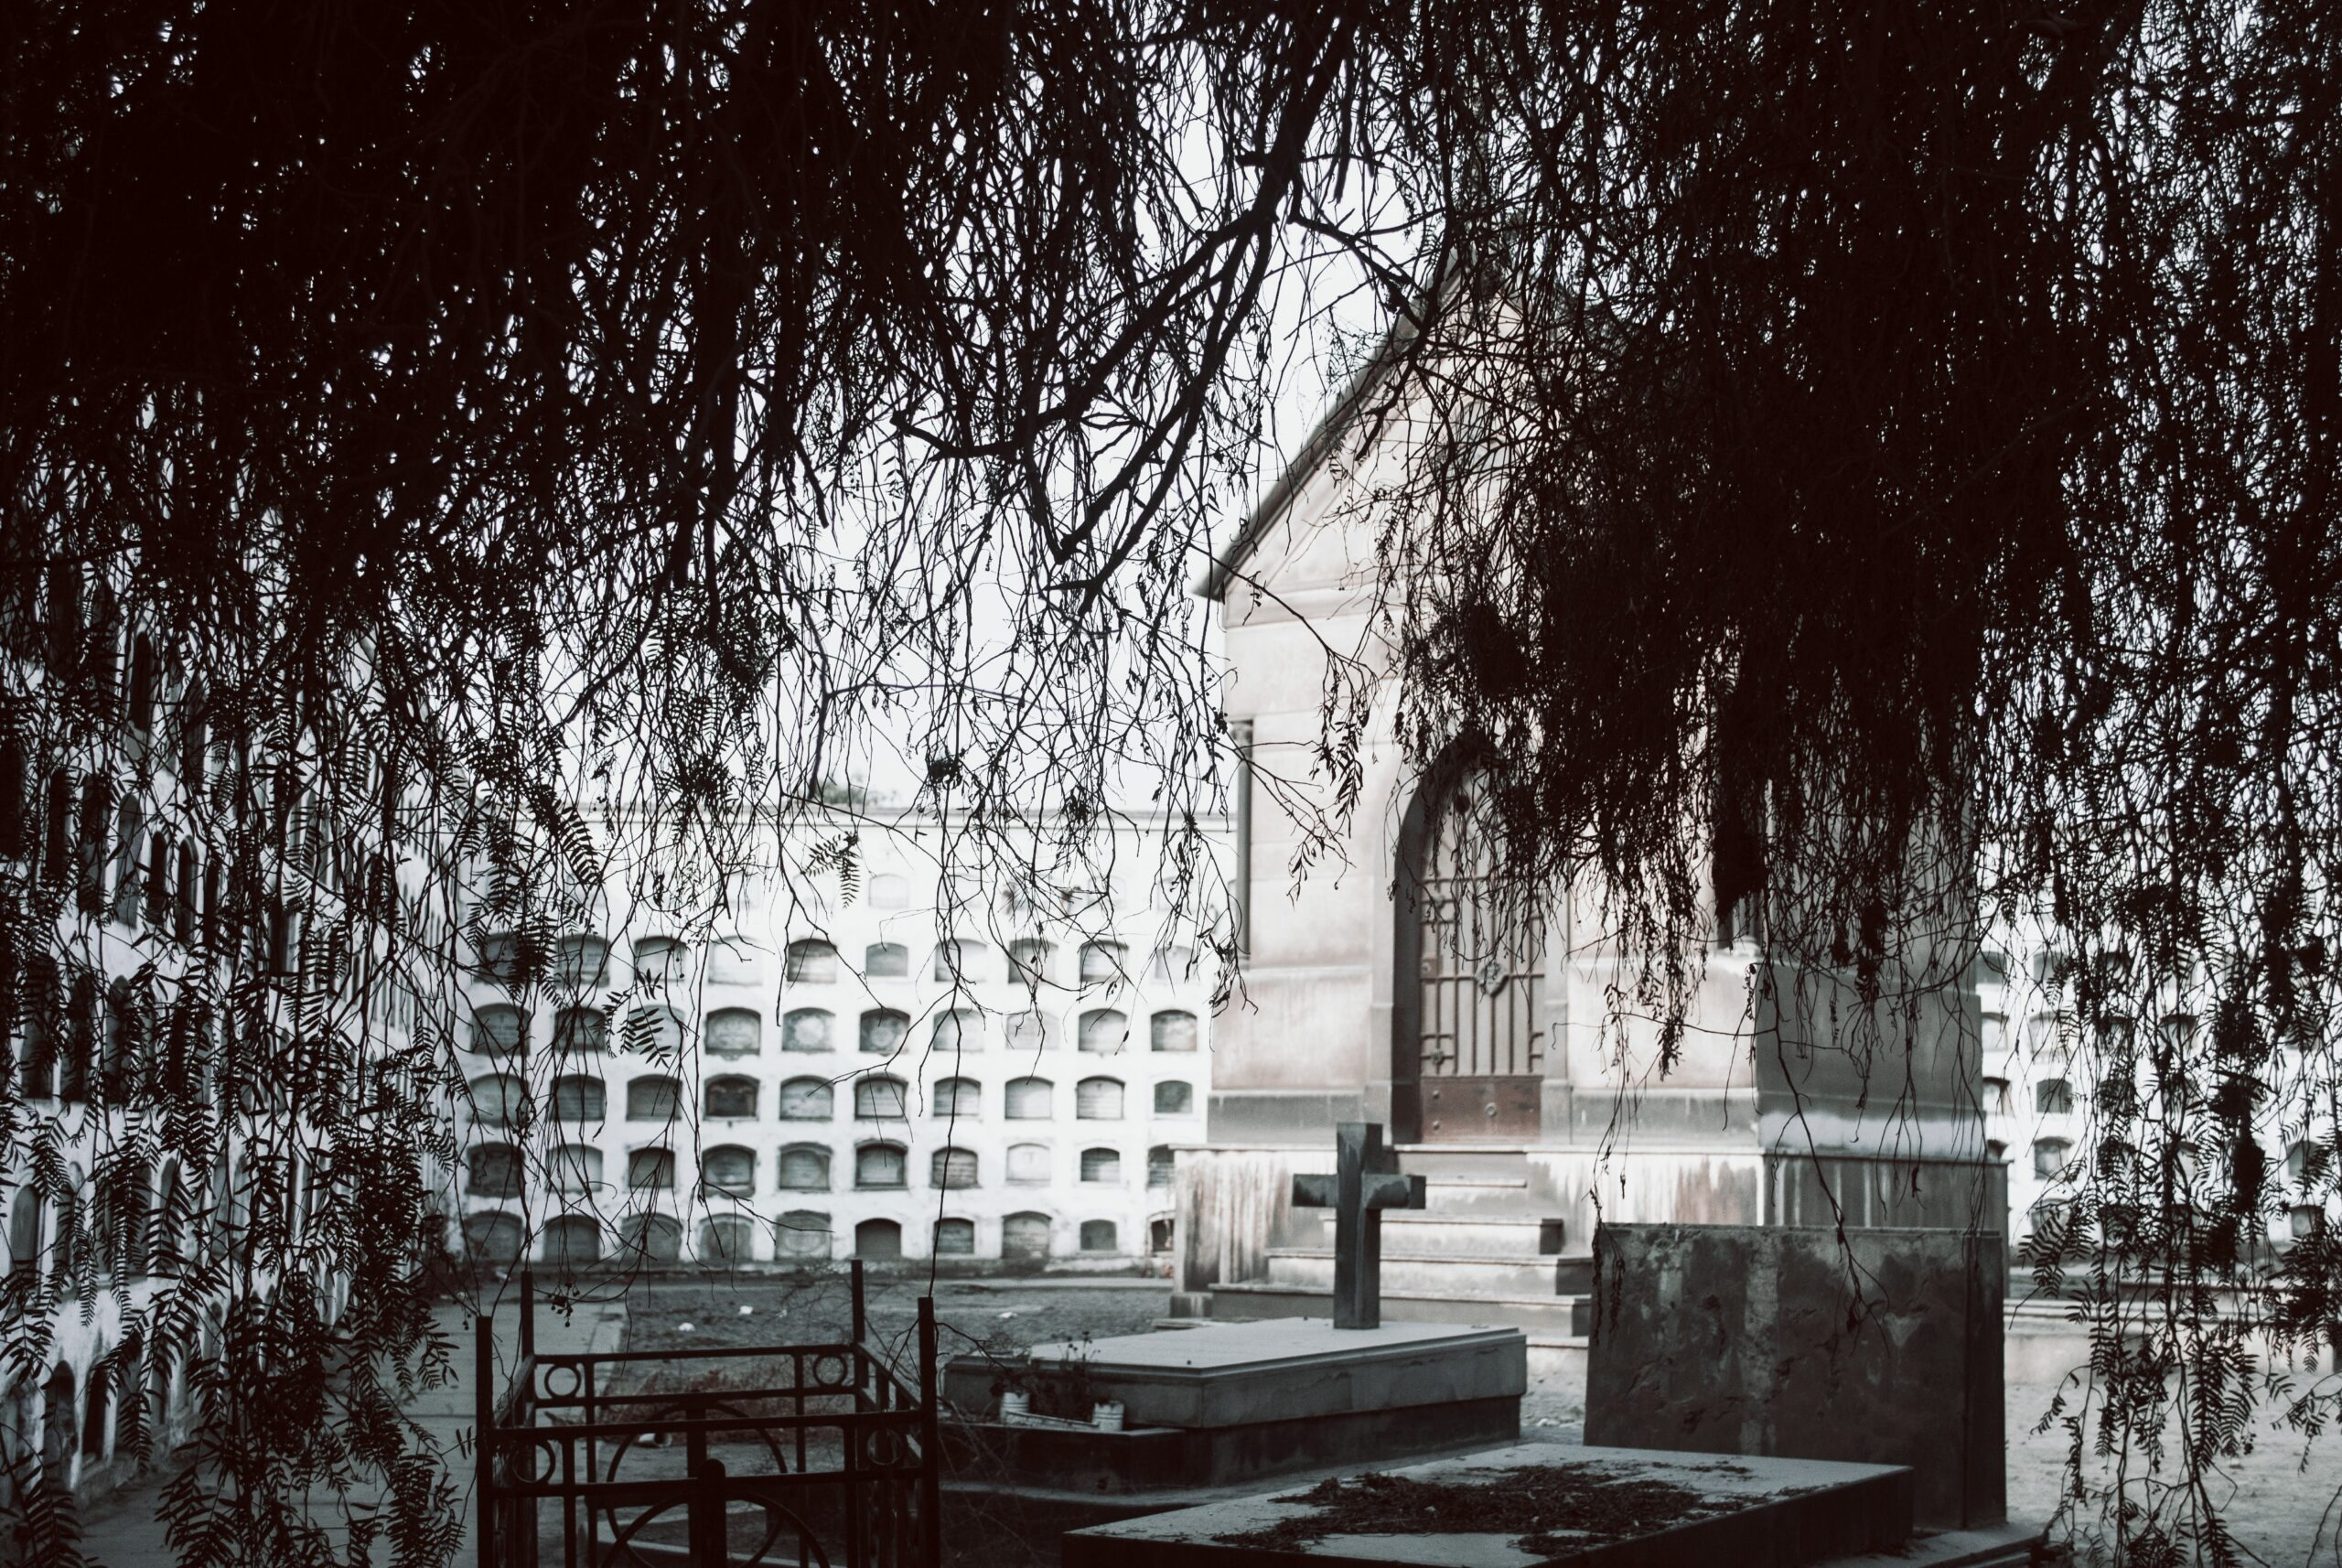 cementerio tercera edad